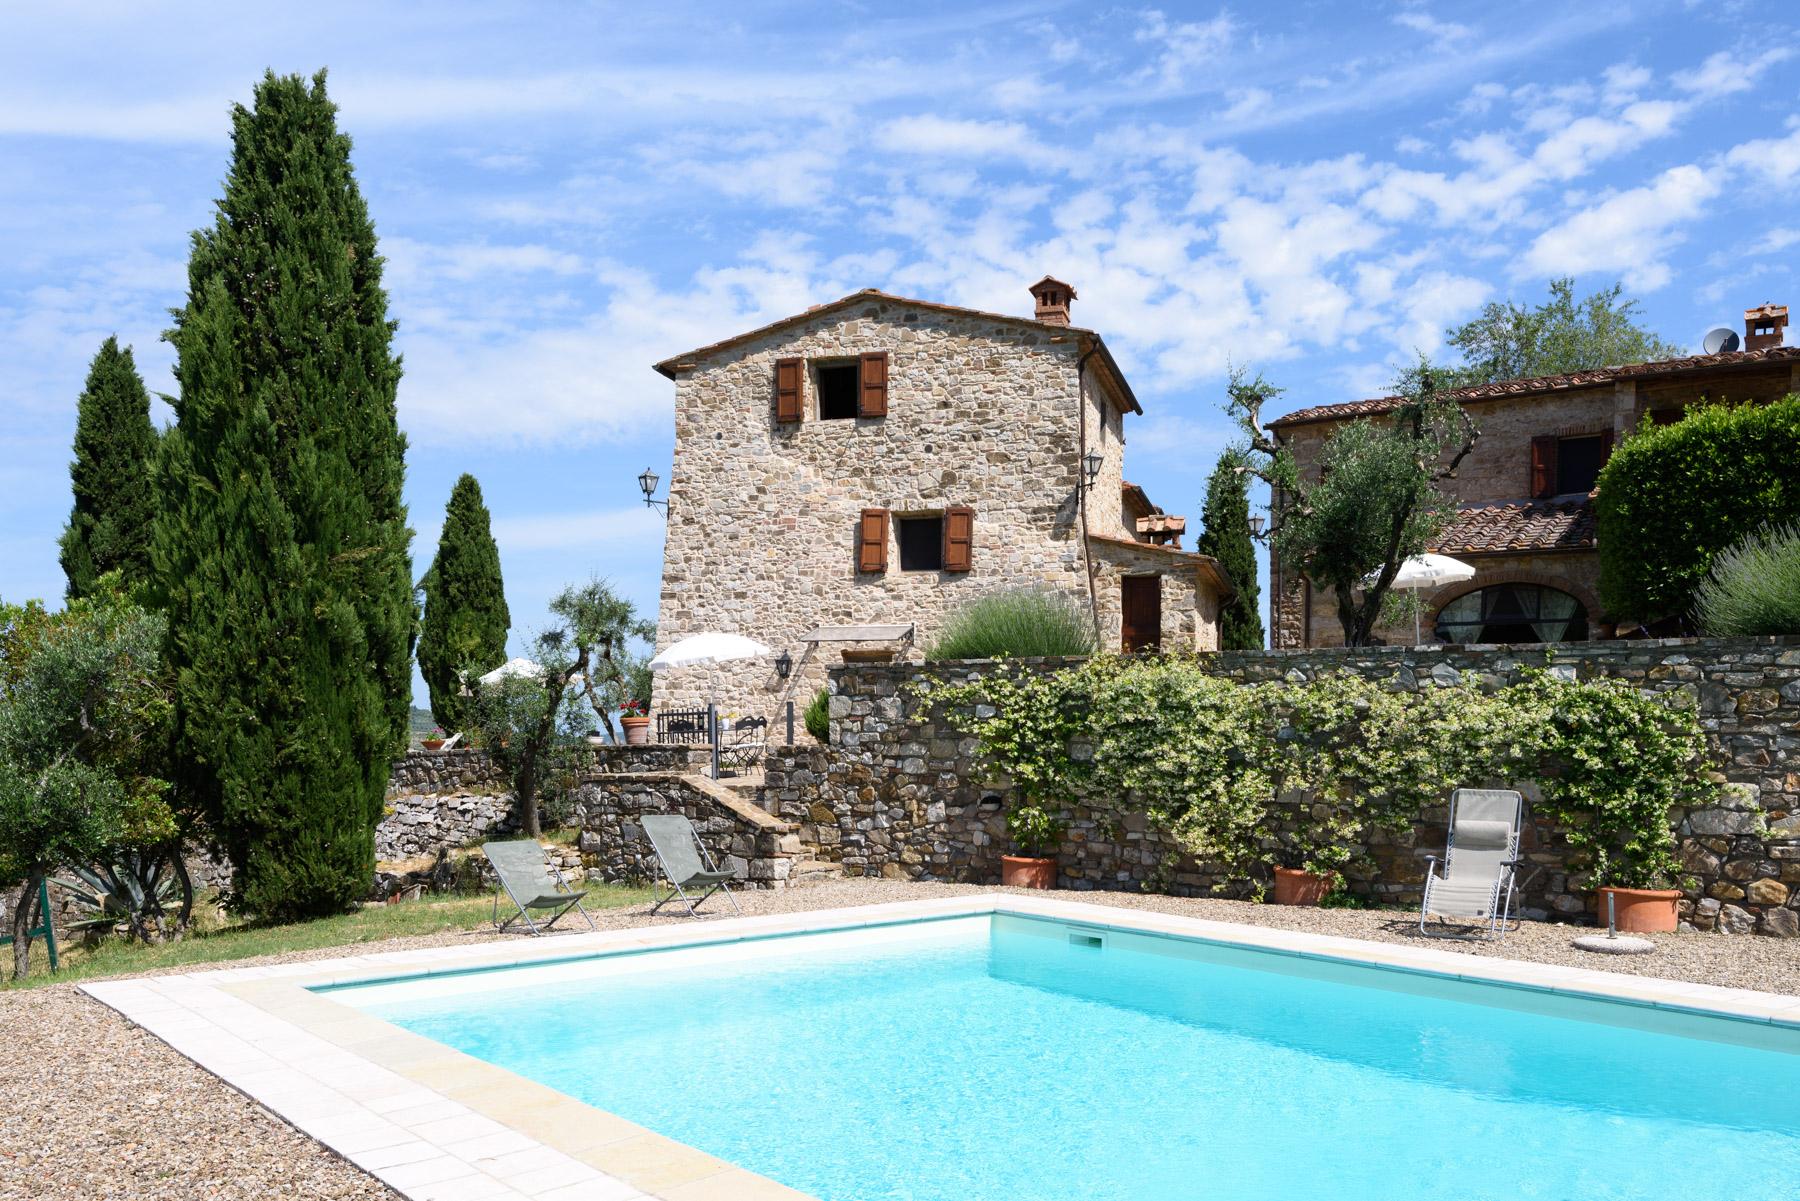 Rustico in Vendita a Castellina In Chianti: 5 locali, 650 mq - Foto 1